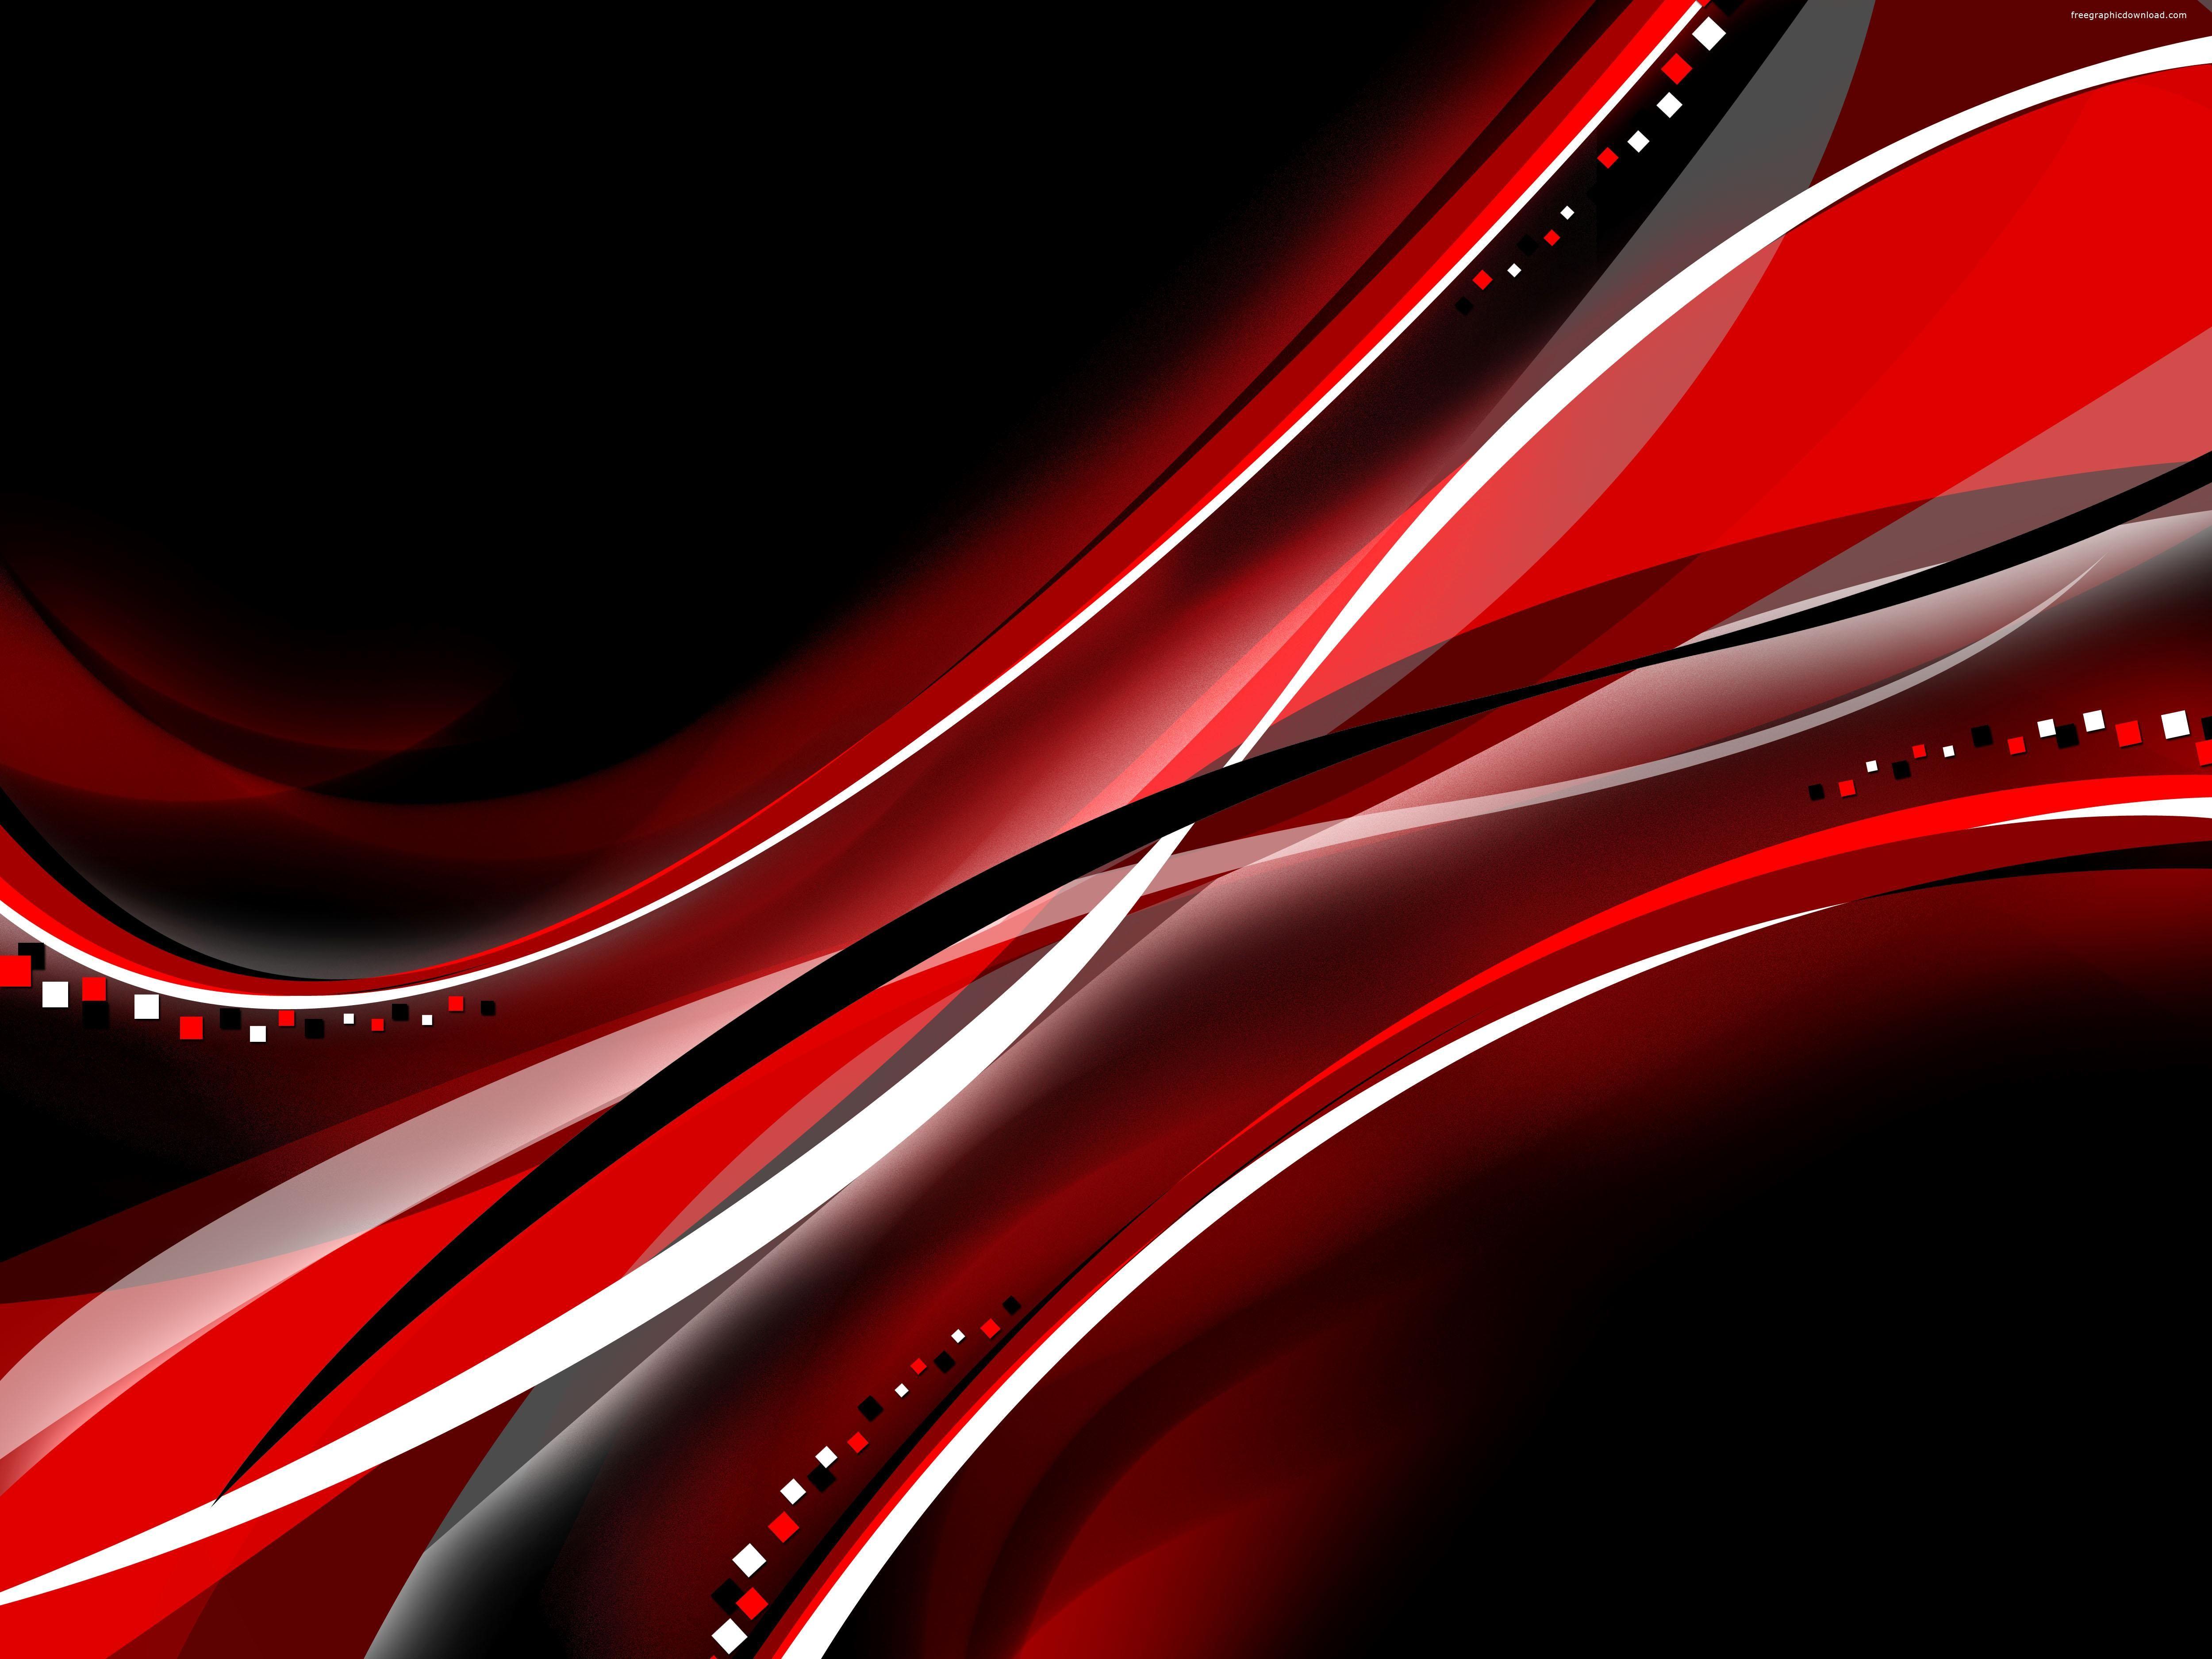 Black Red Wallpaper Hd 255521 Black Phone Wallpaper Red Wallpaper Abstract Wallpaper